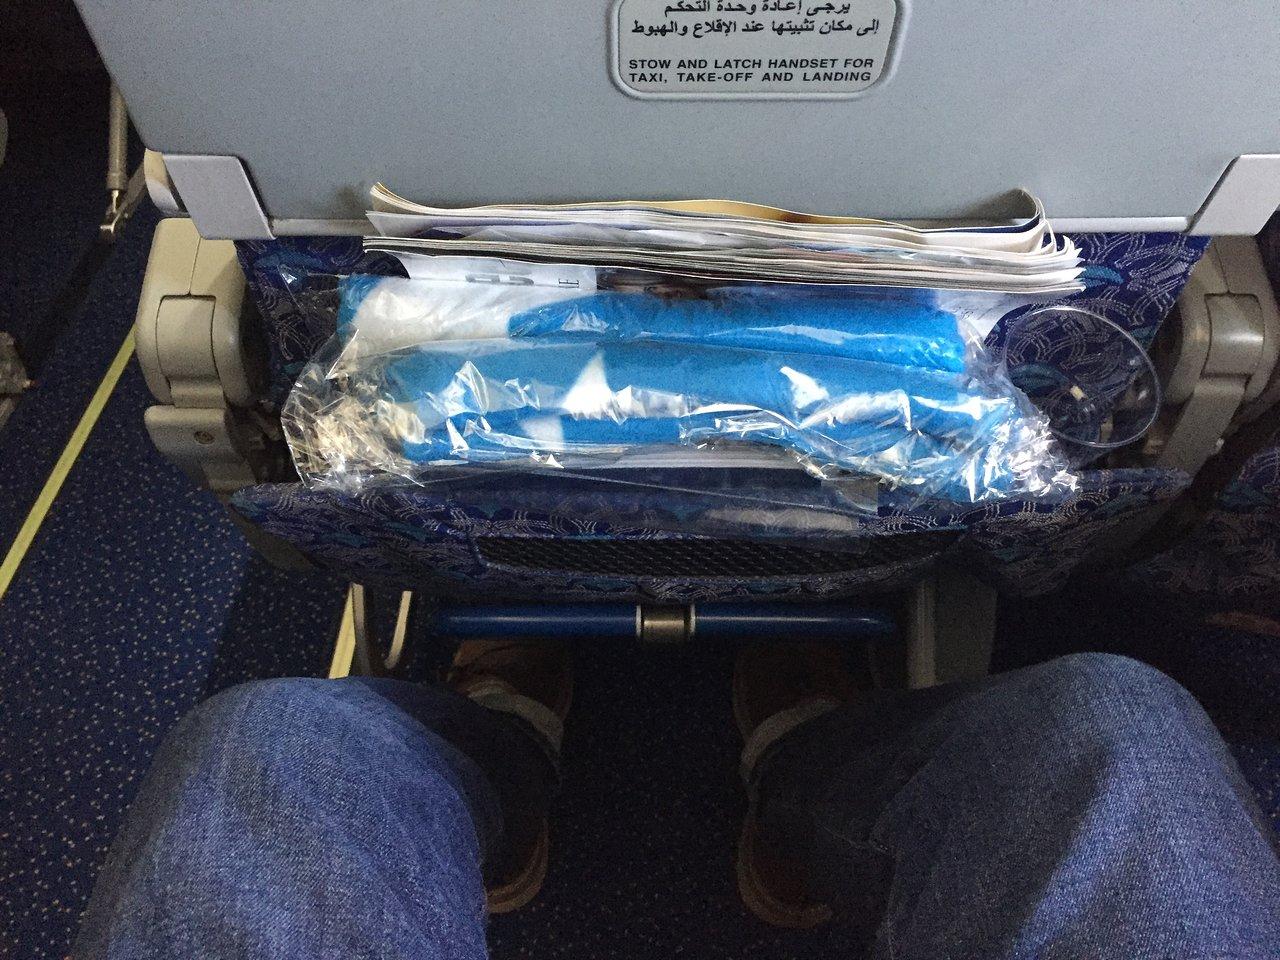 EGYPTAIR Flights and Reviews (with photos) - TripAdvisor